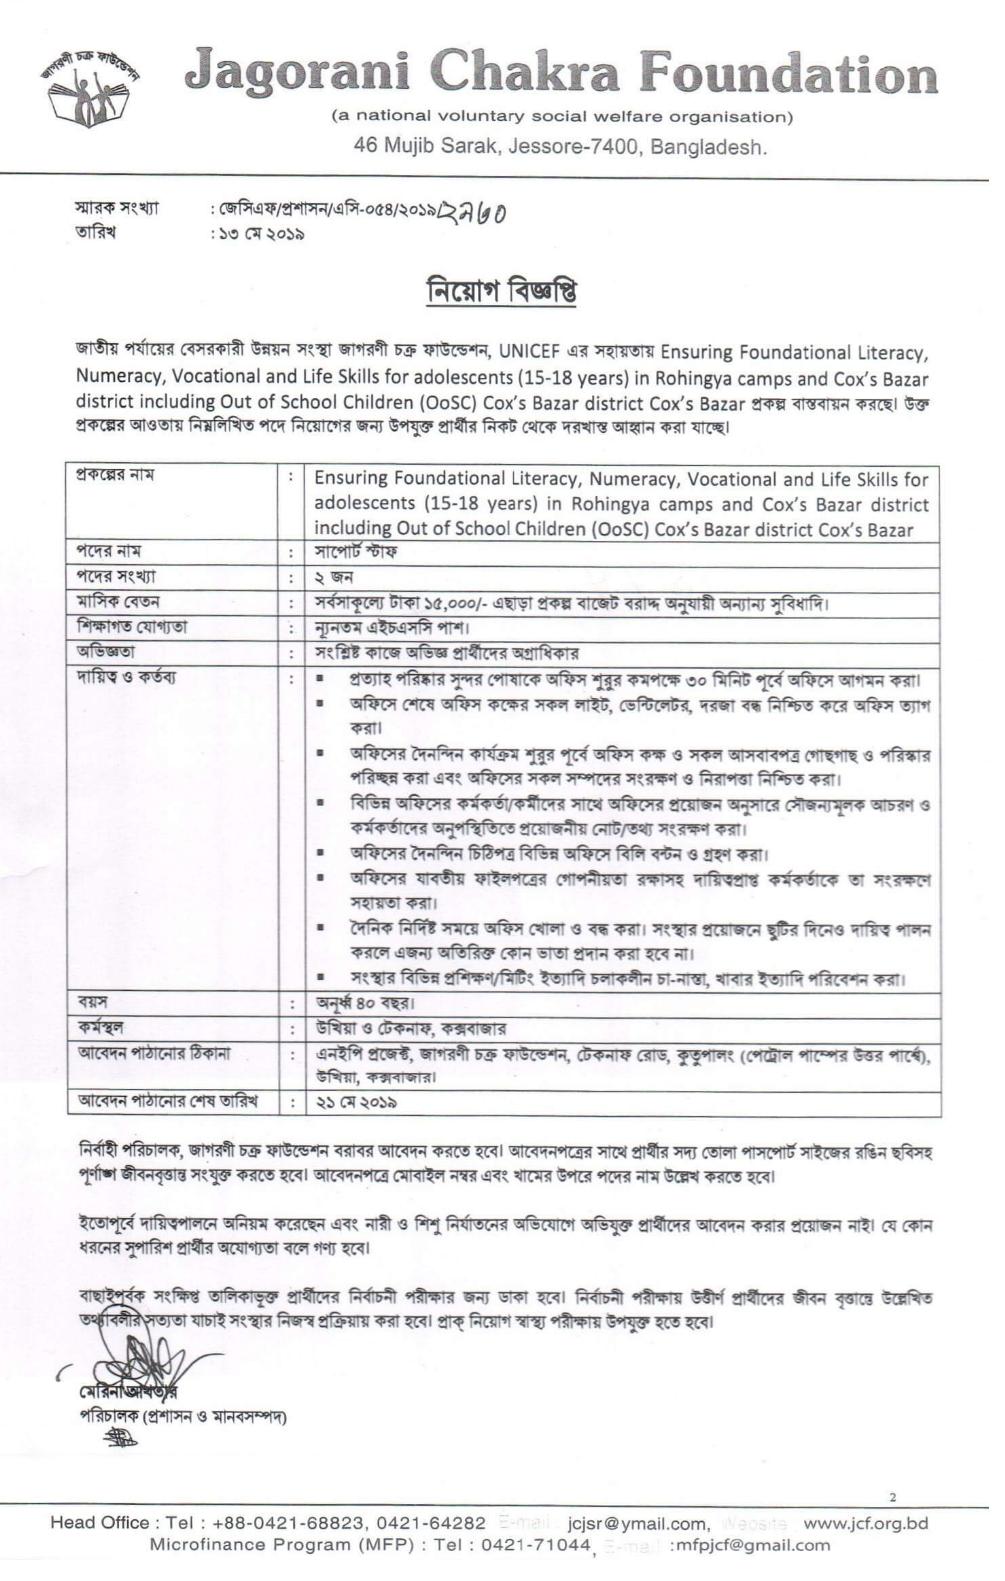 Jagorani Chakra Foundation job circular 2019